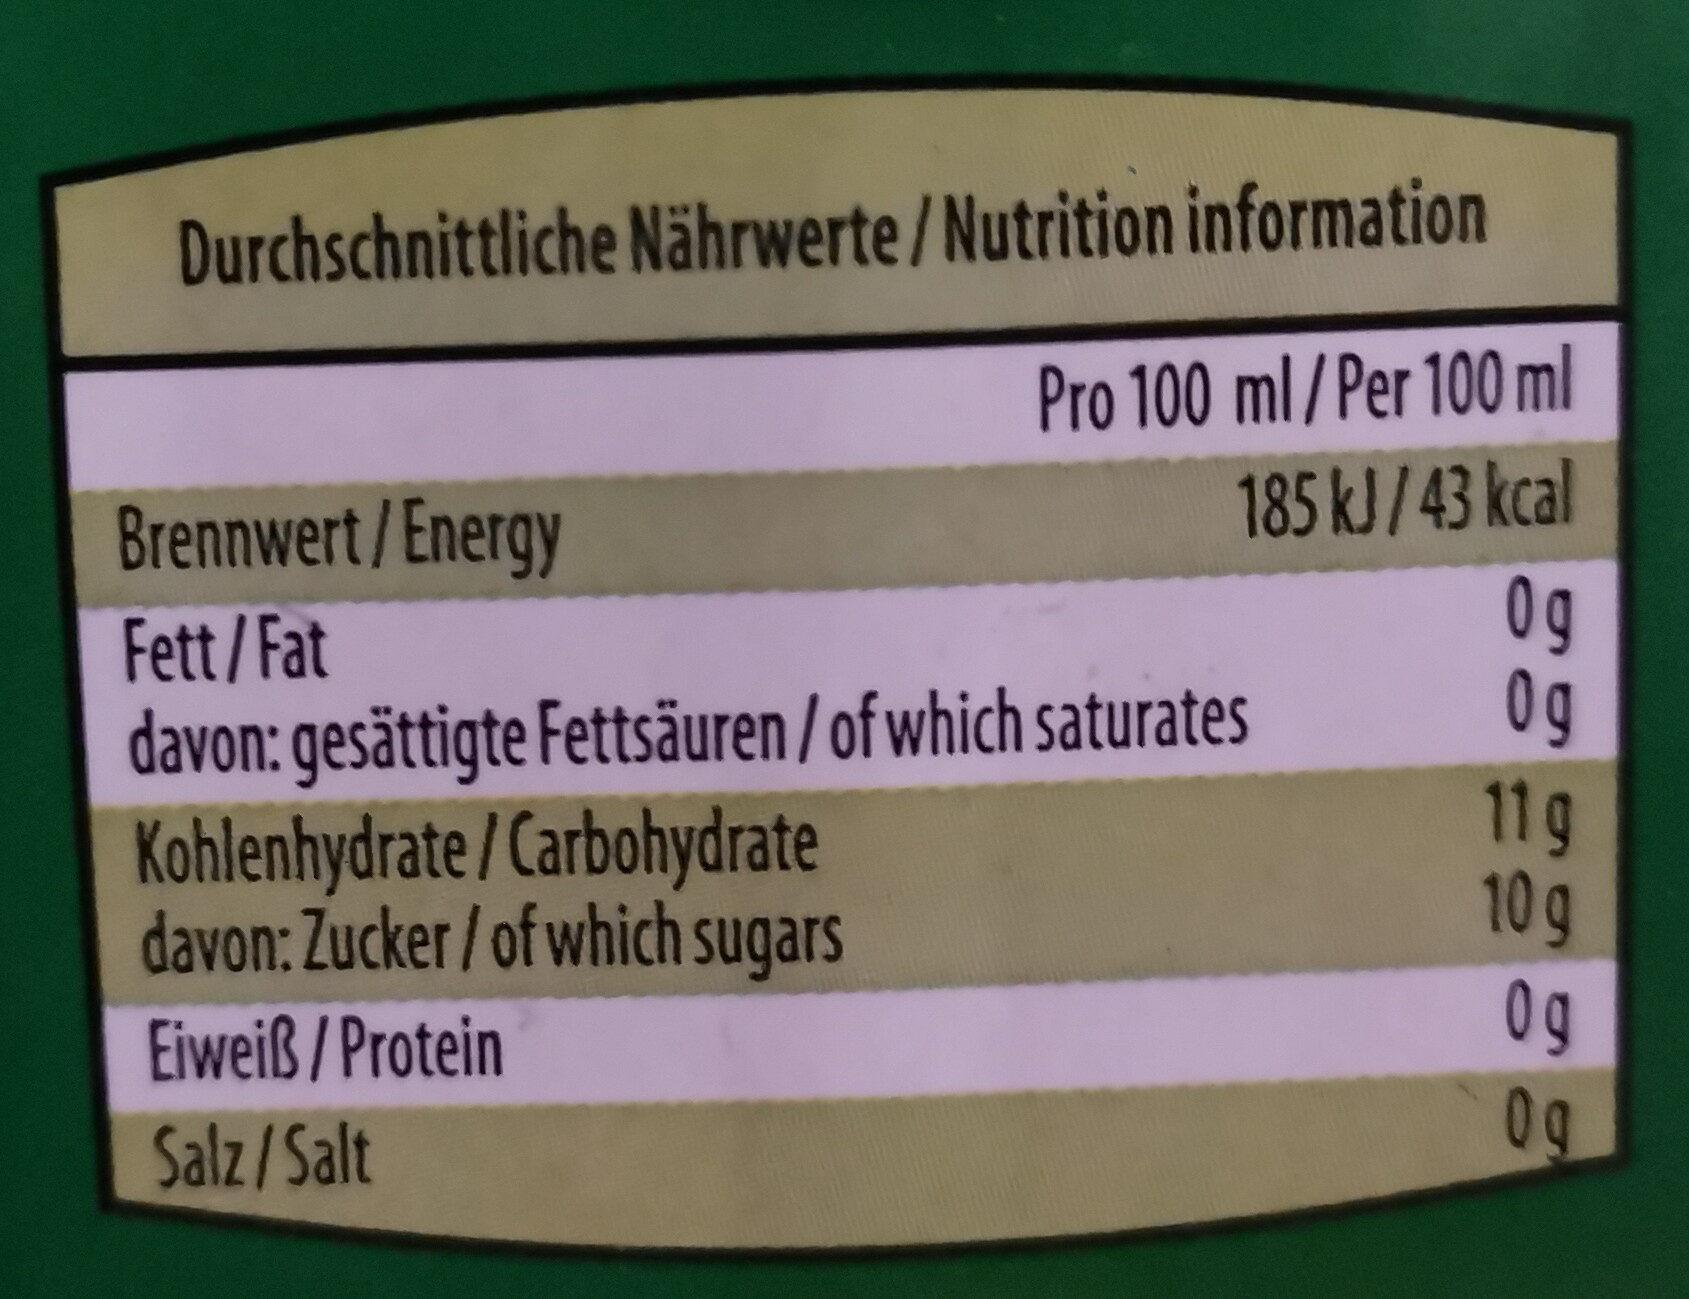 Durstlöscher Waldmeister-Geschmack - Nährwertangaben - de